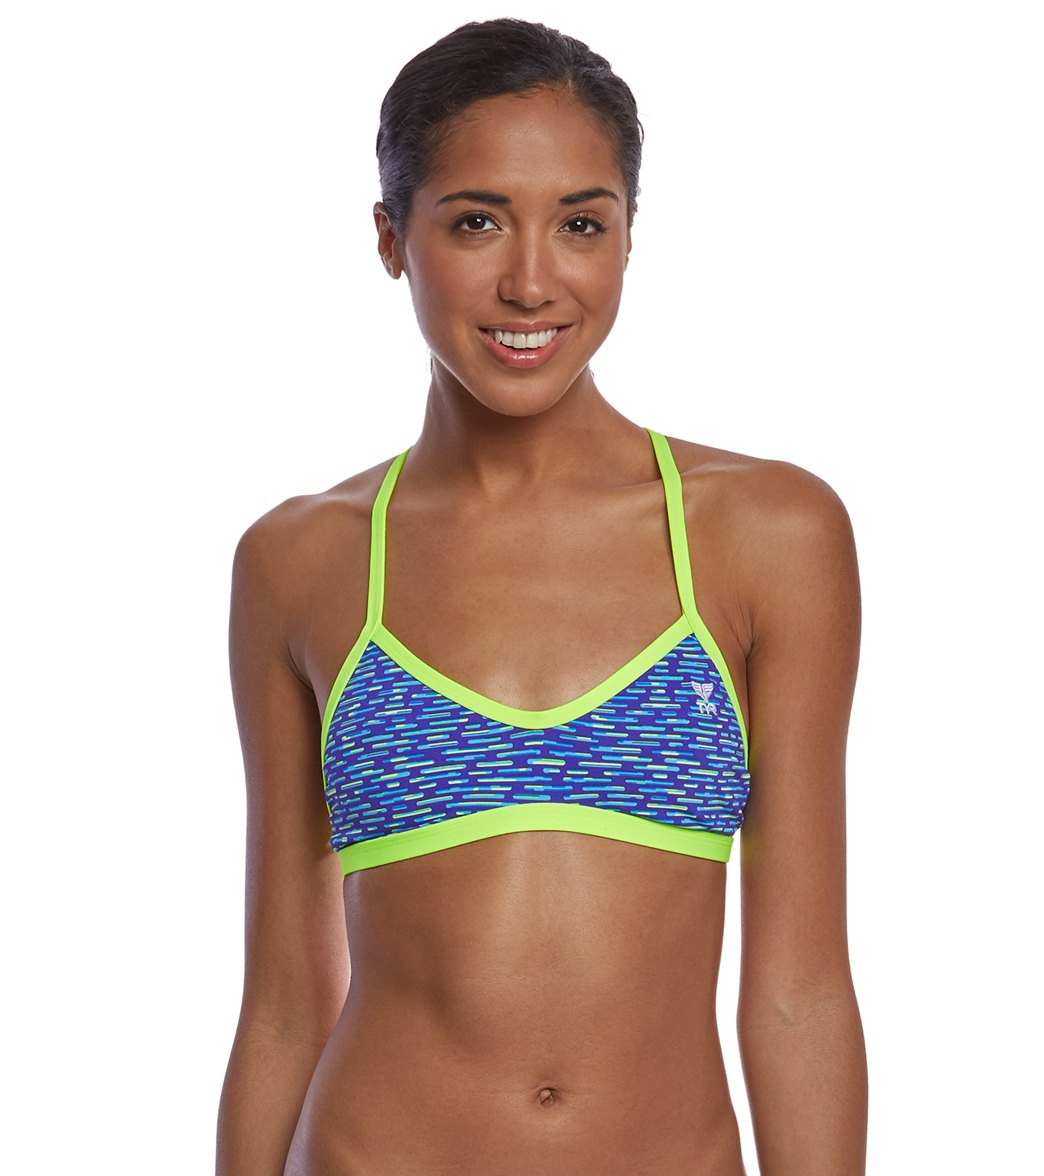 66b047099b2e4 TYR Women s Vitality Crosscut Tieback Bikini Top at SwimOutlet.com